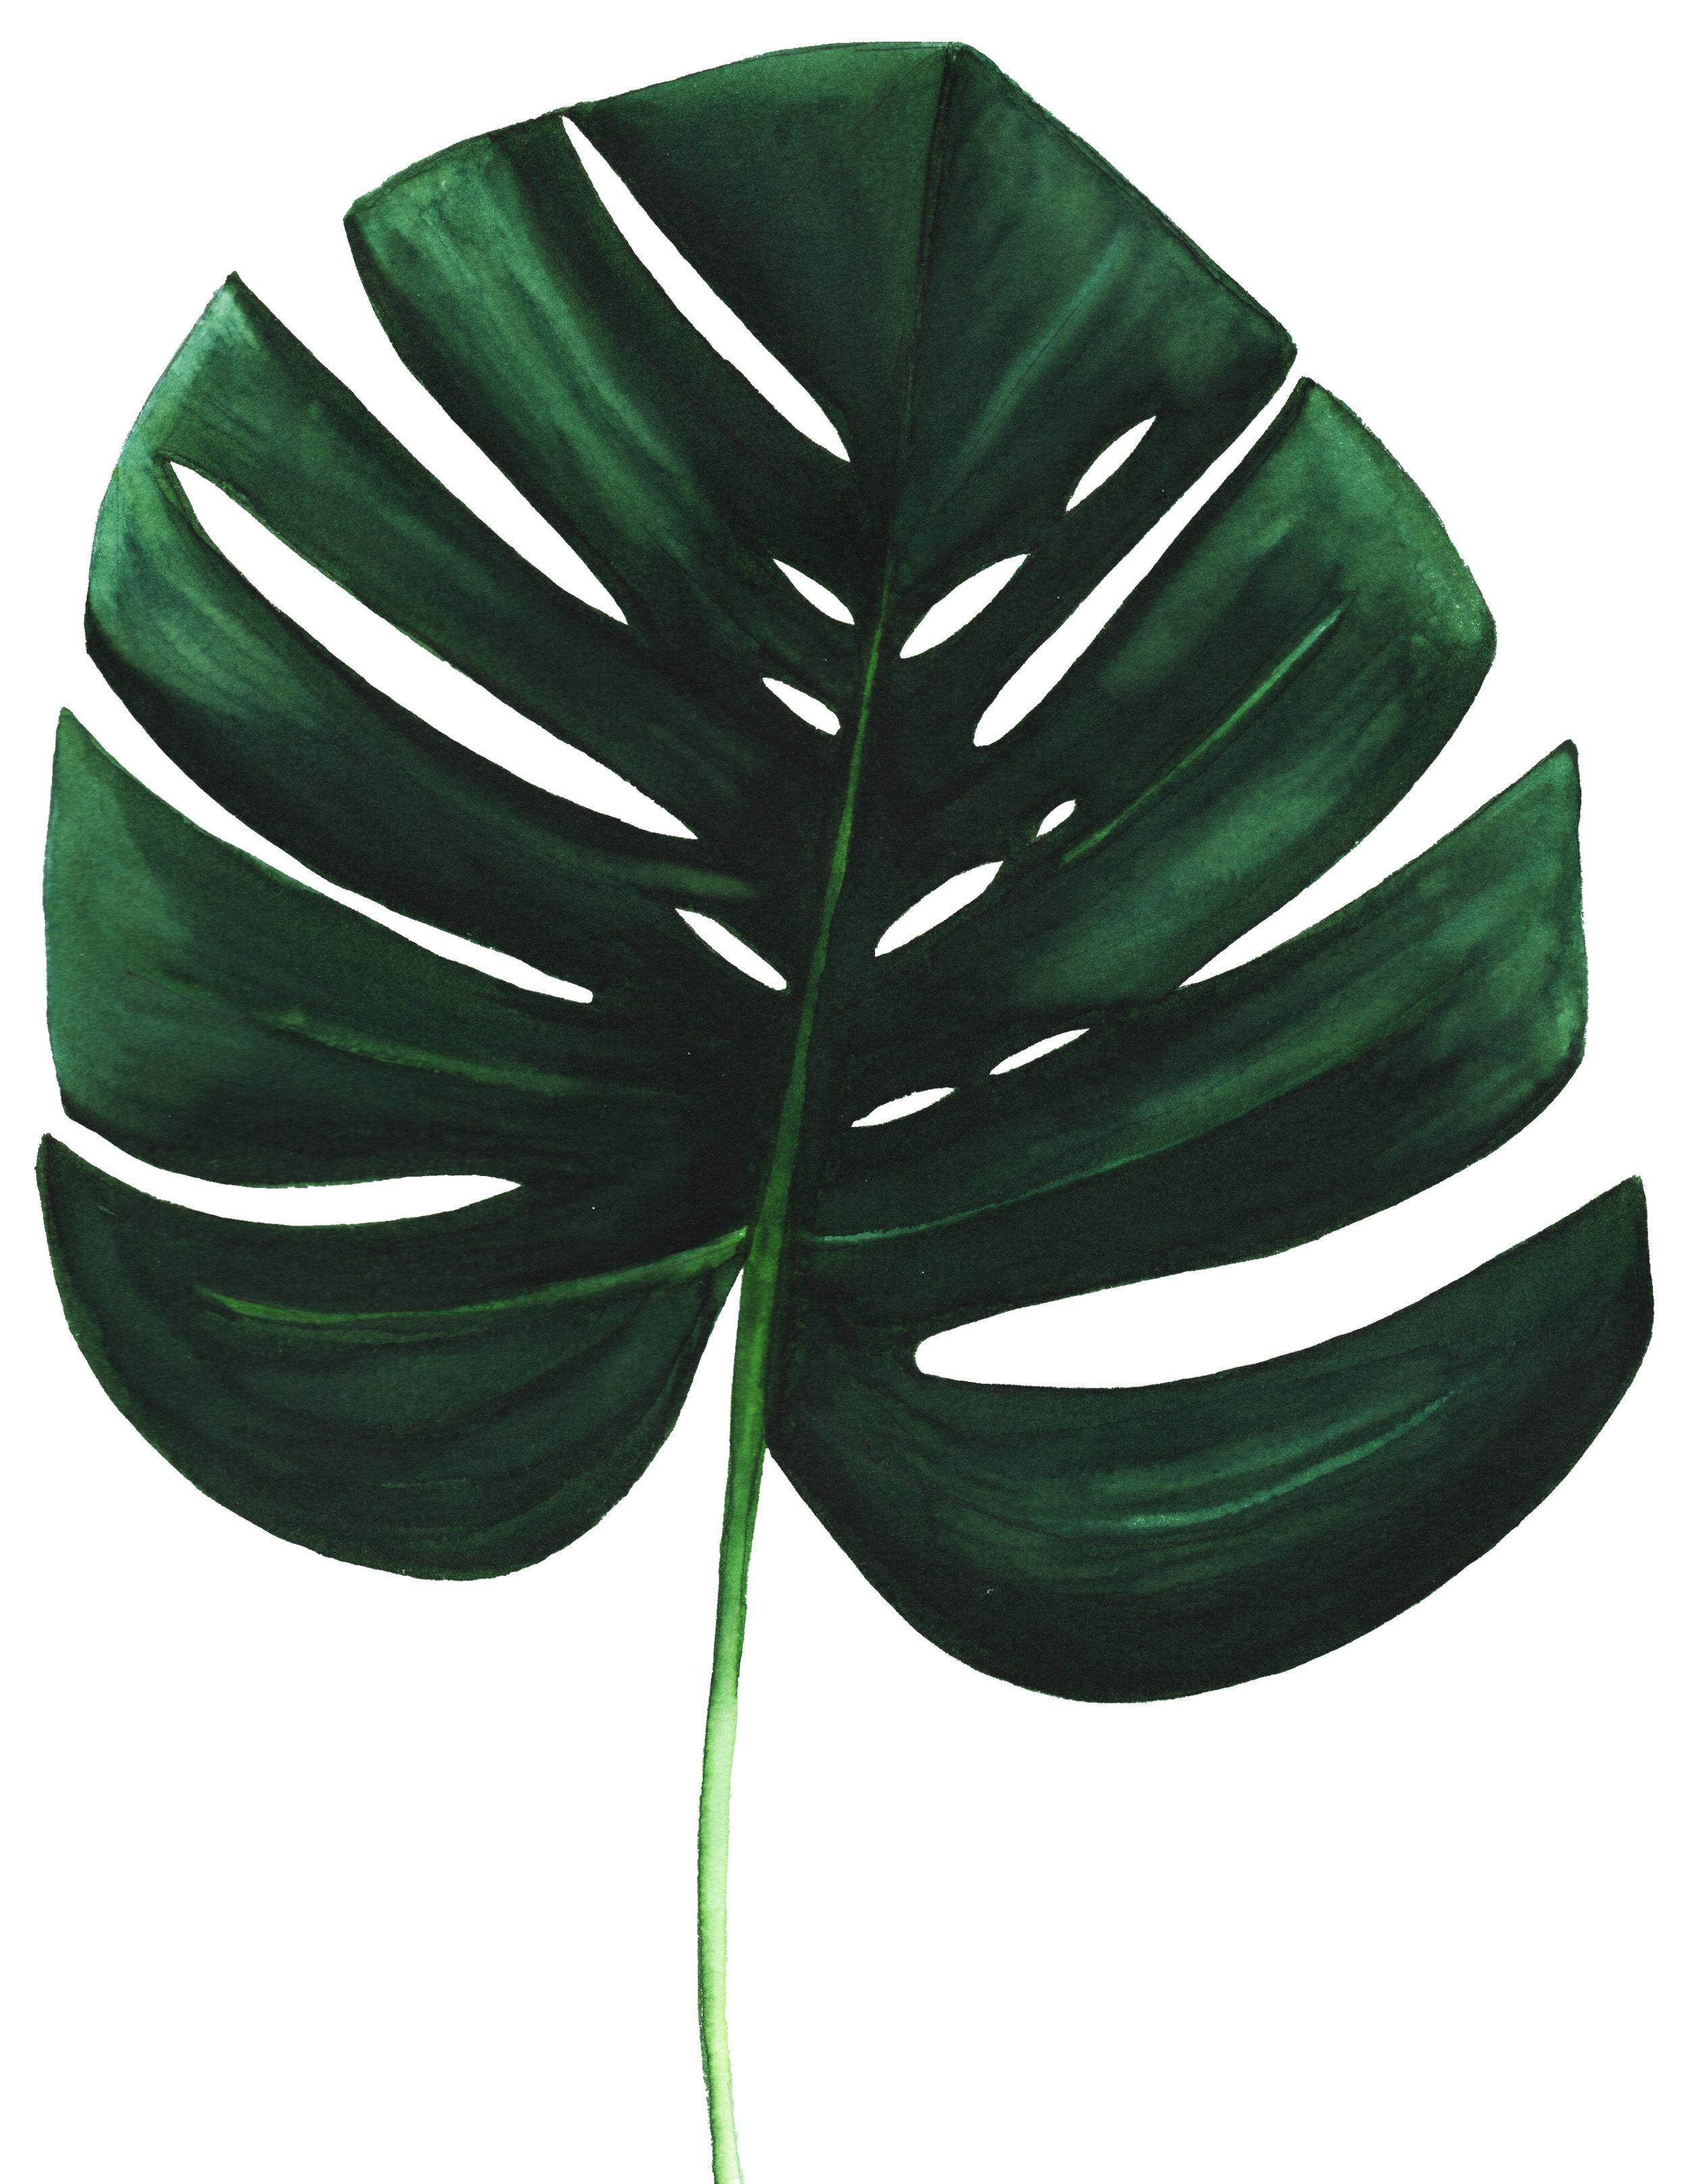 Edited Leaf.jpg